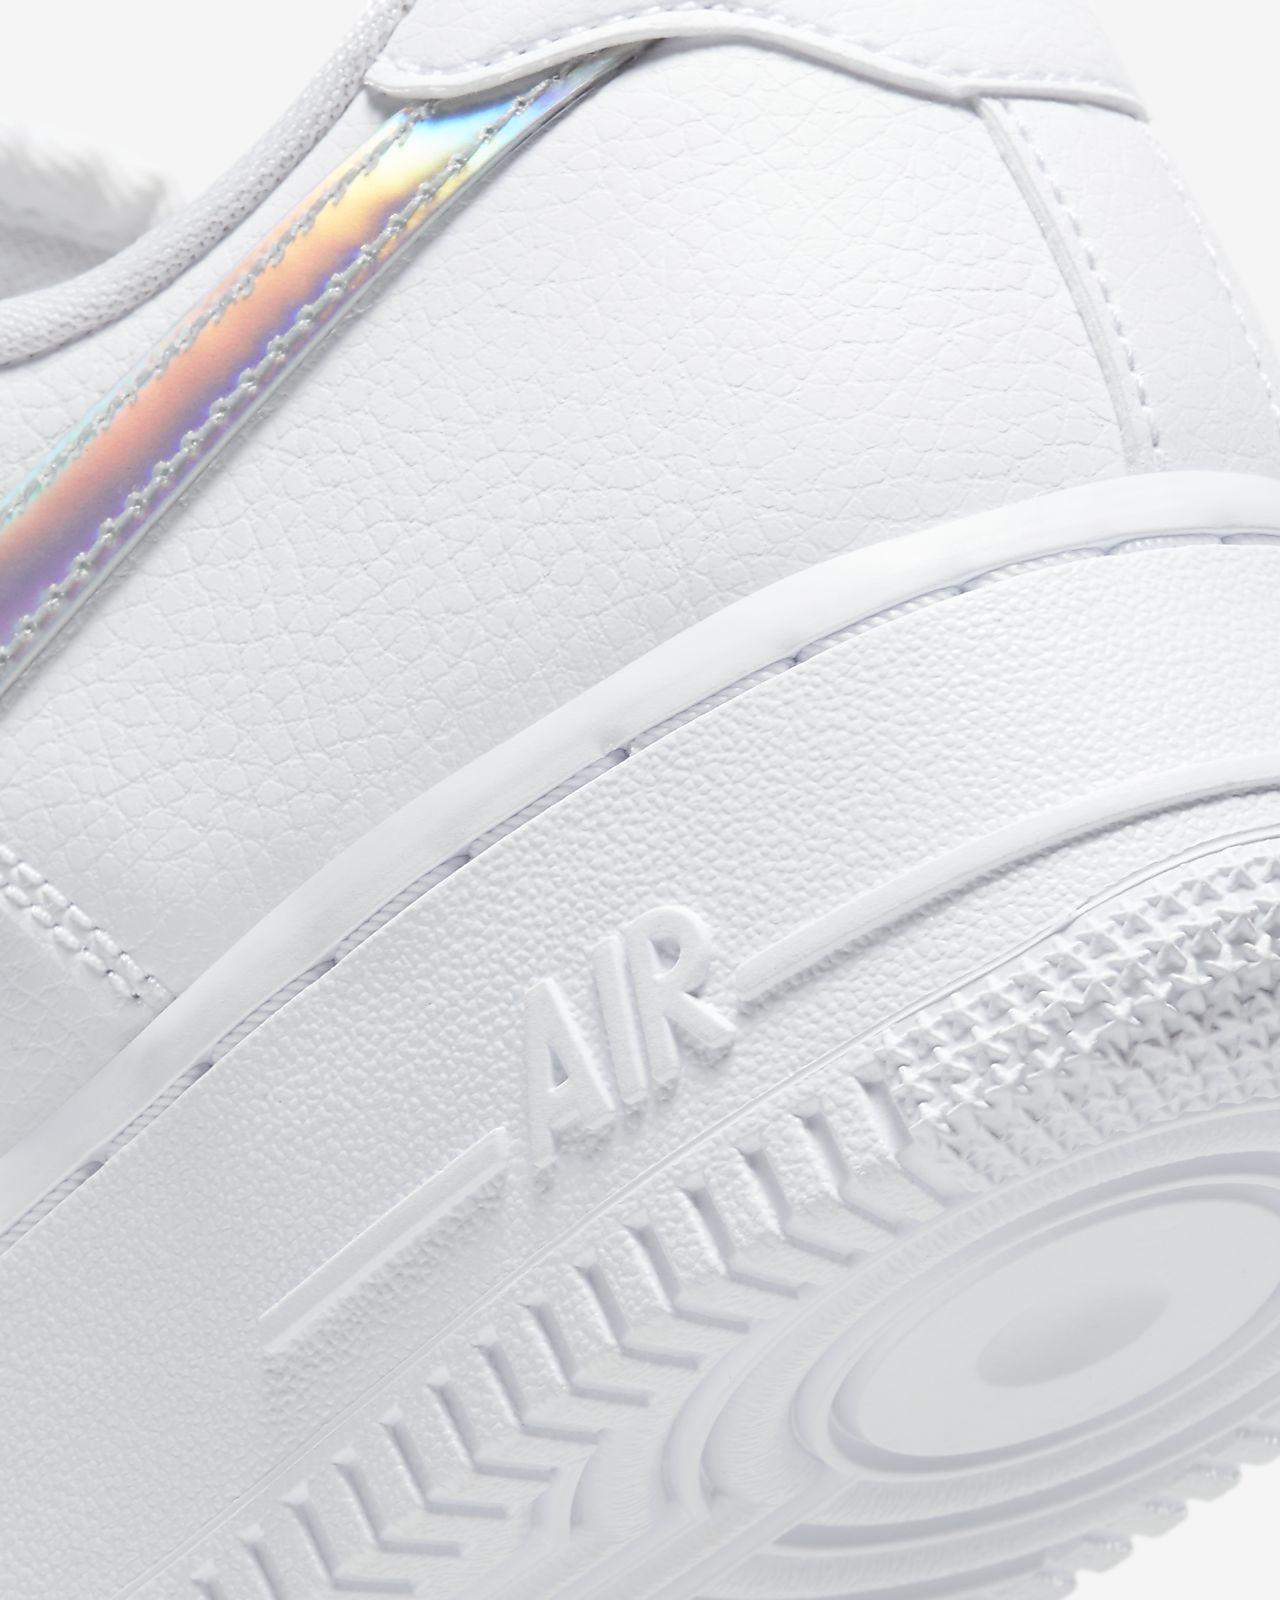 Nike Air Force 1 '07 Essential Women's Shoe. Nike NL